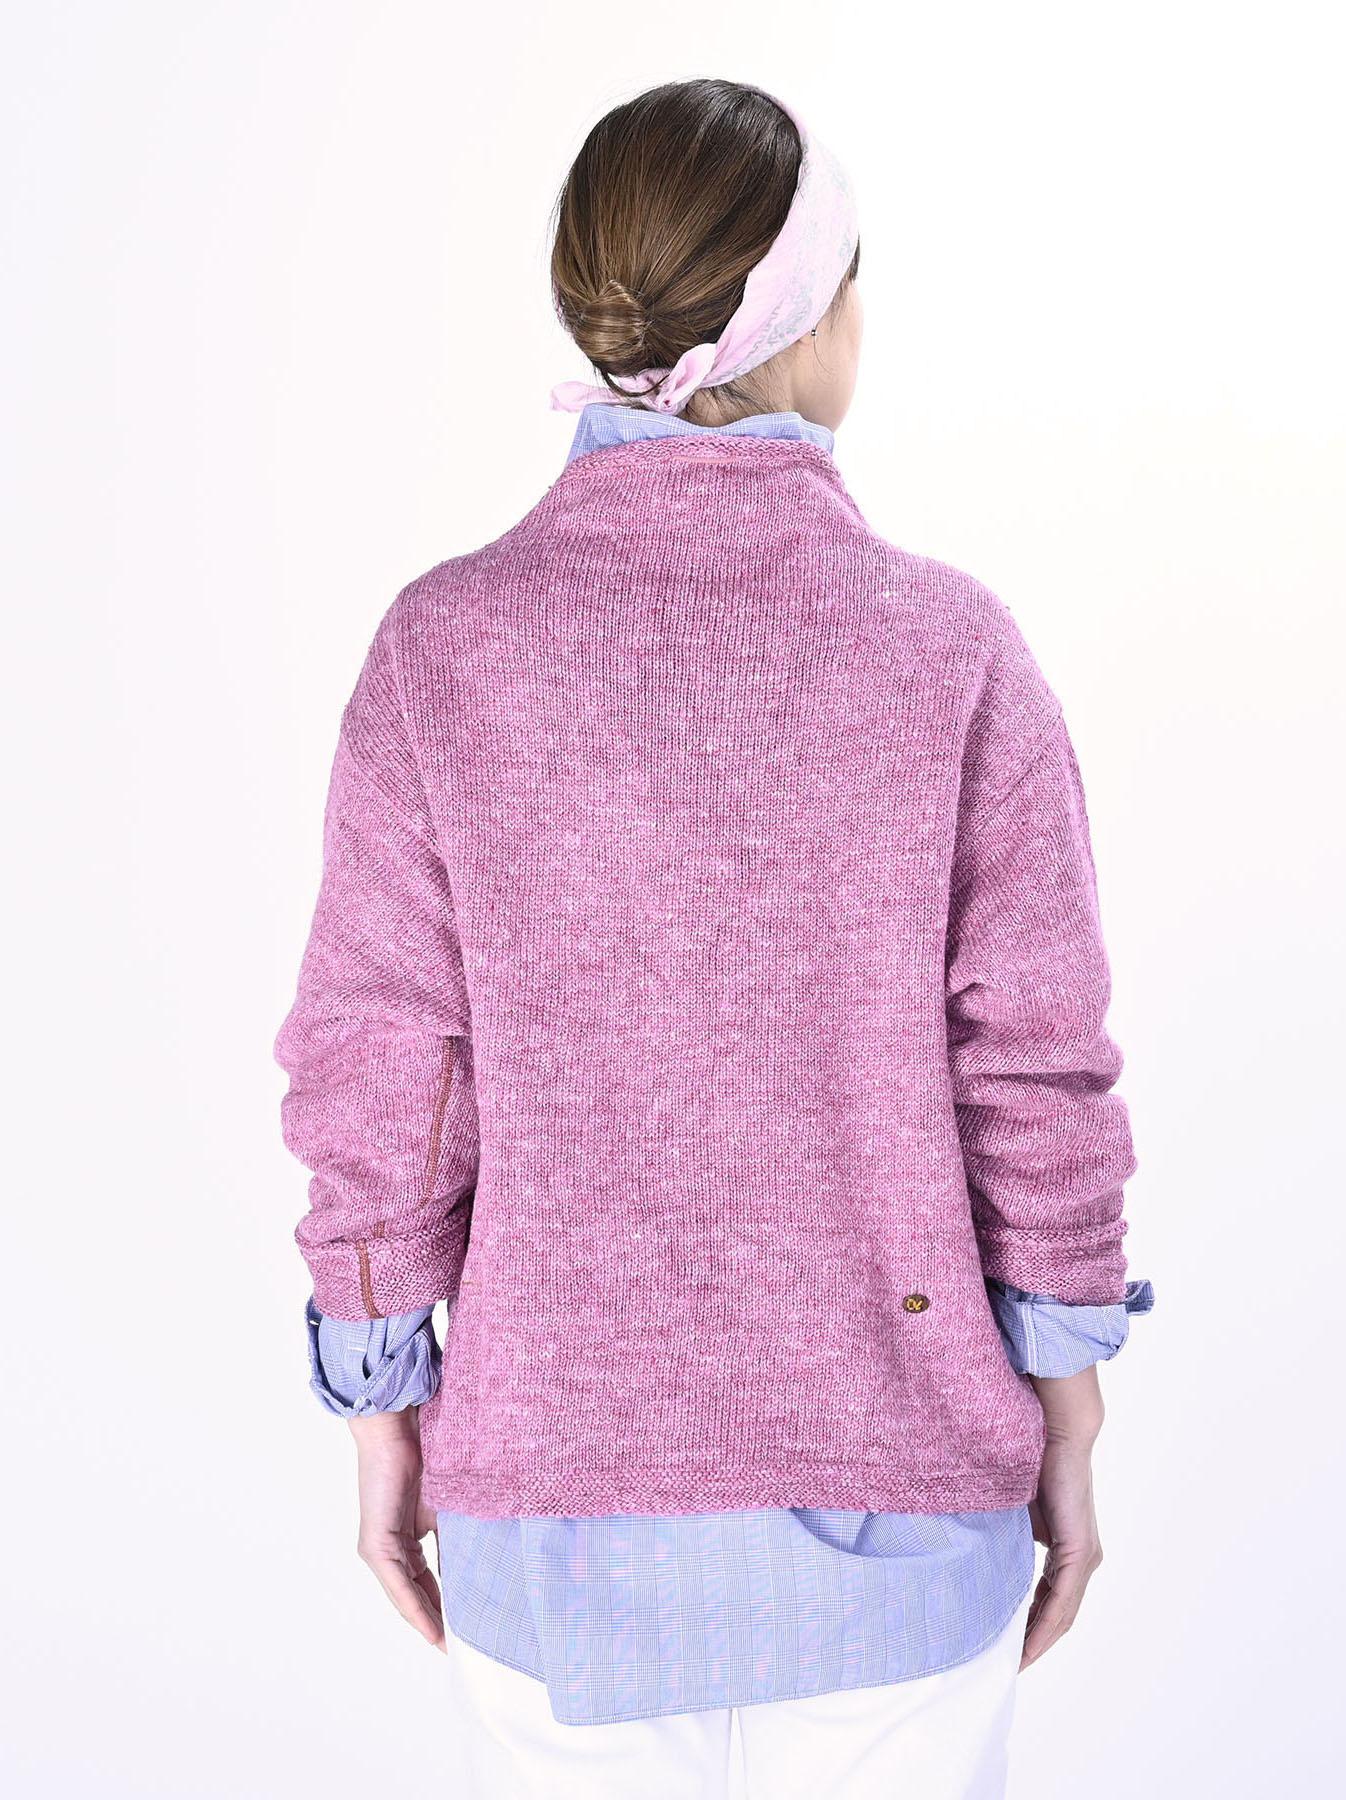 WH Linen Tweed Knit-sew 908 Umahiko Sweater (0321)-8